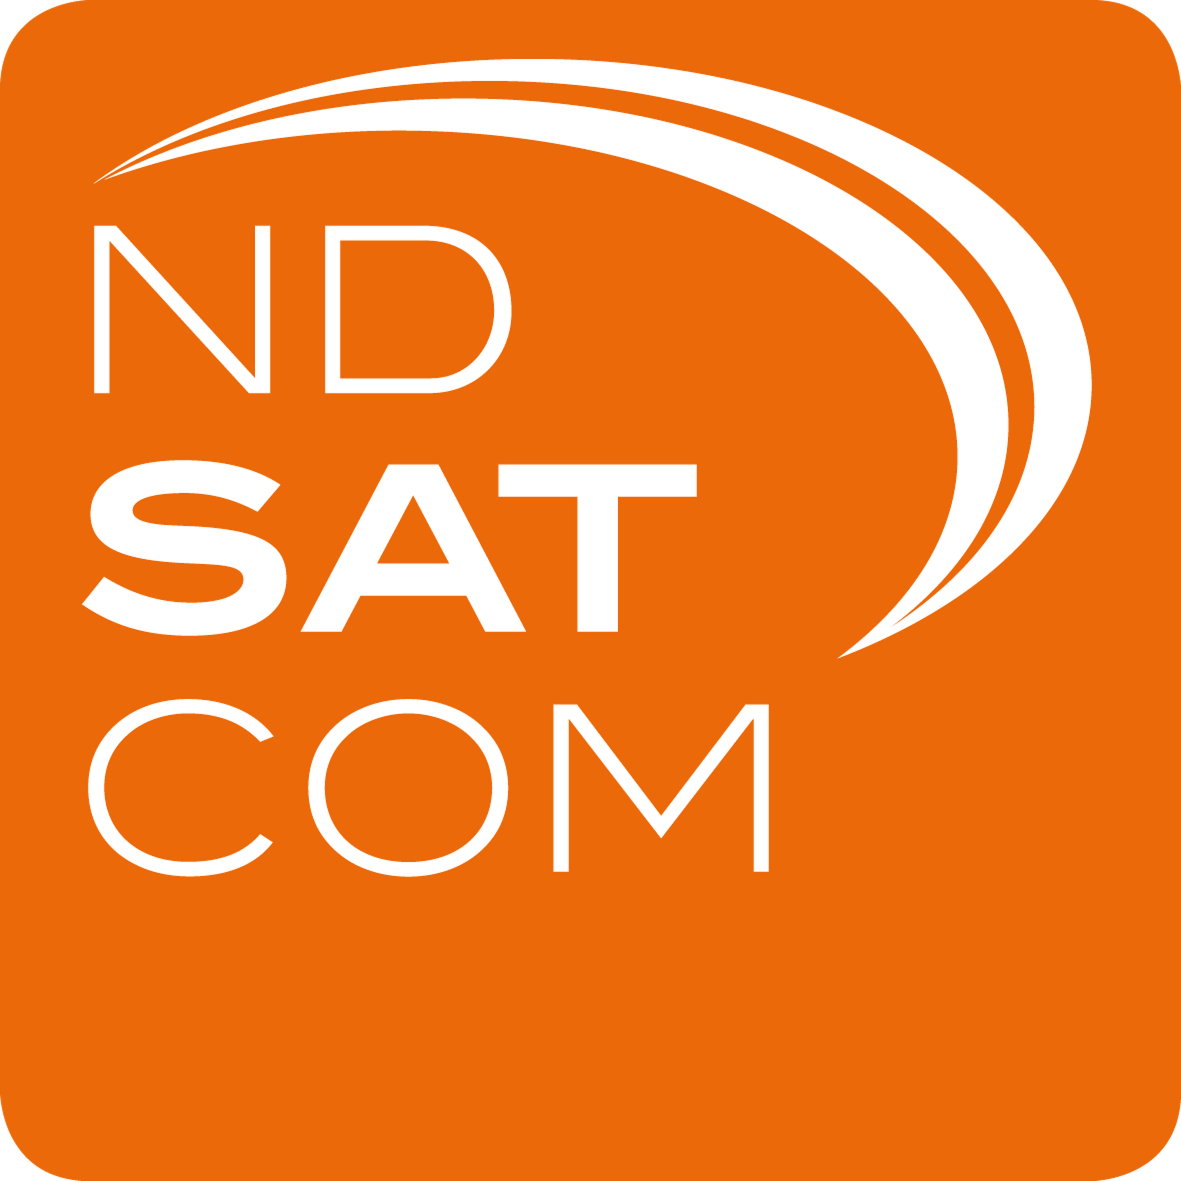 Nd Satcom Gasellschaft Fur Satellitenkommunikations Systeme Mbh- Abu Dhabi